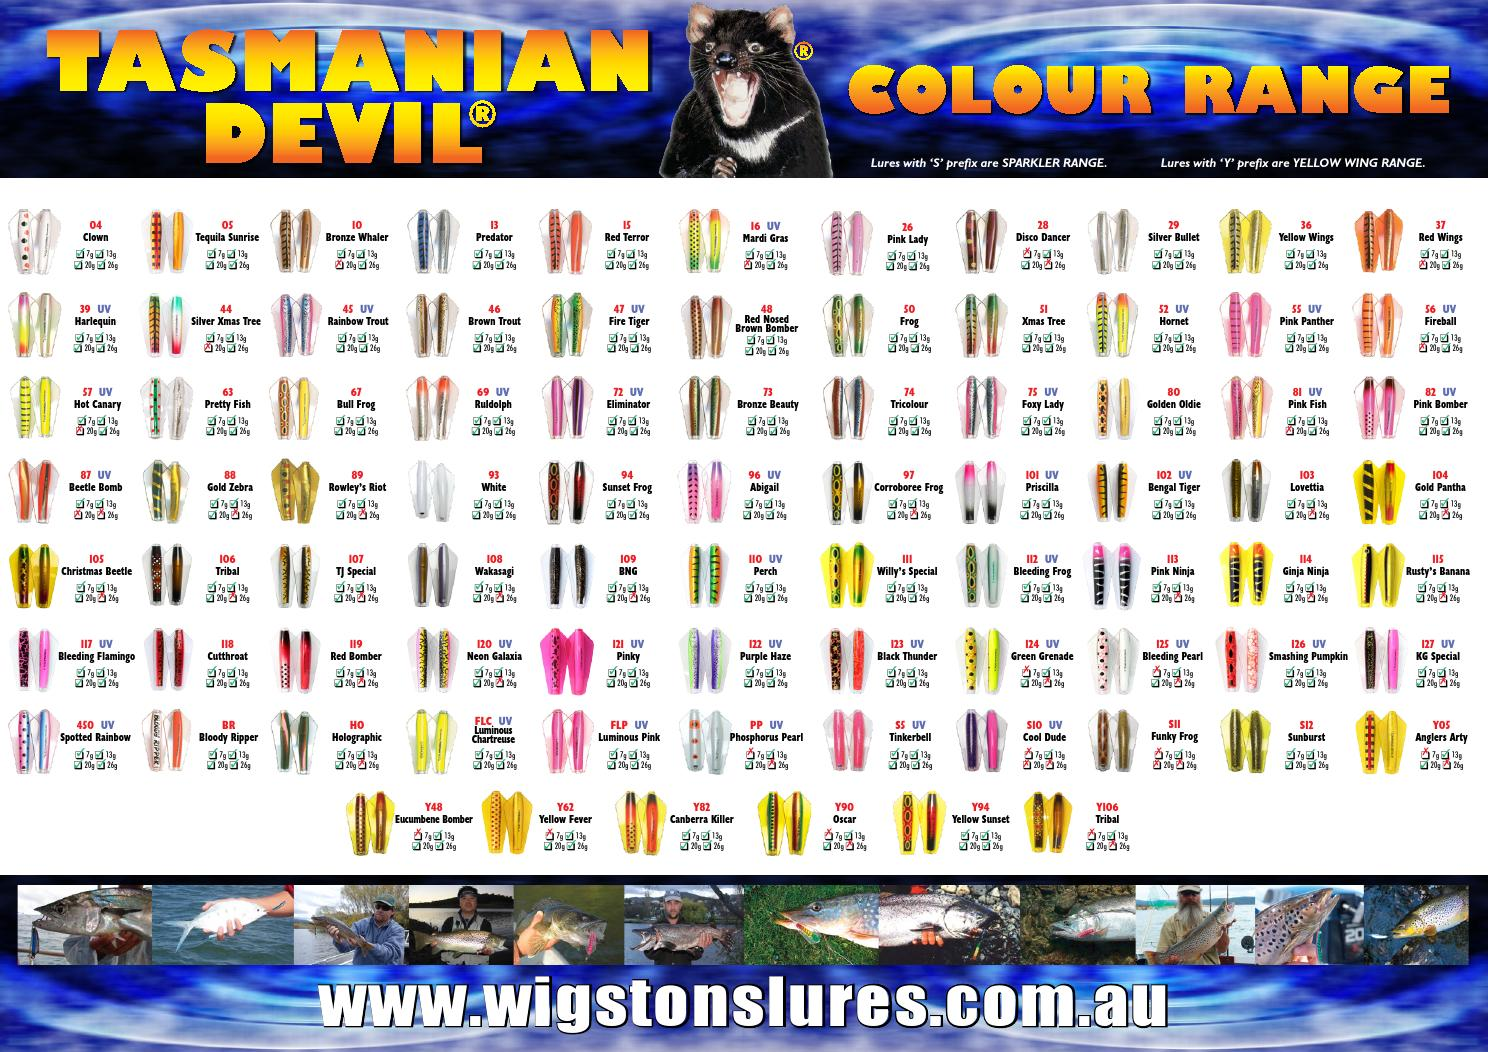 Tasmanian Devil 55 UV Pink Panther Fishing Lure Tassie 7g 13g 20g 26g